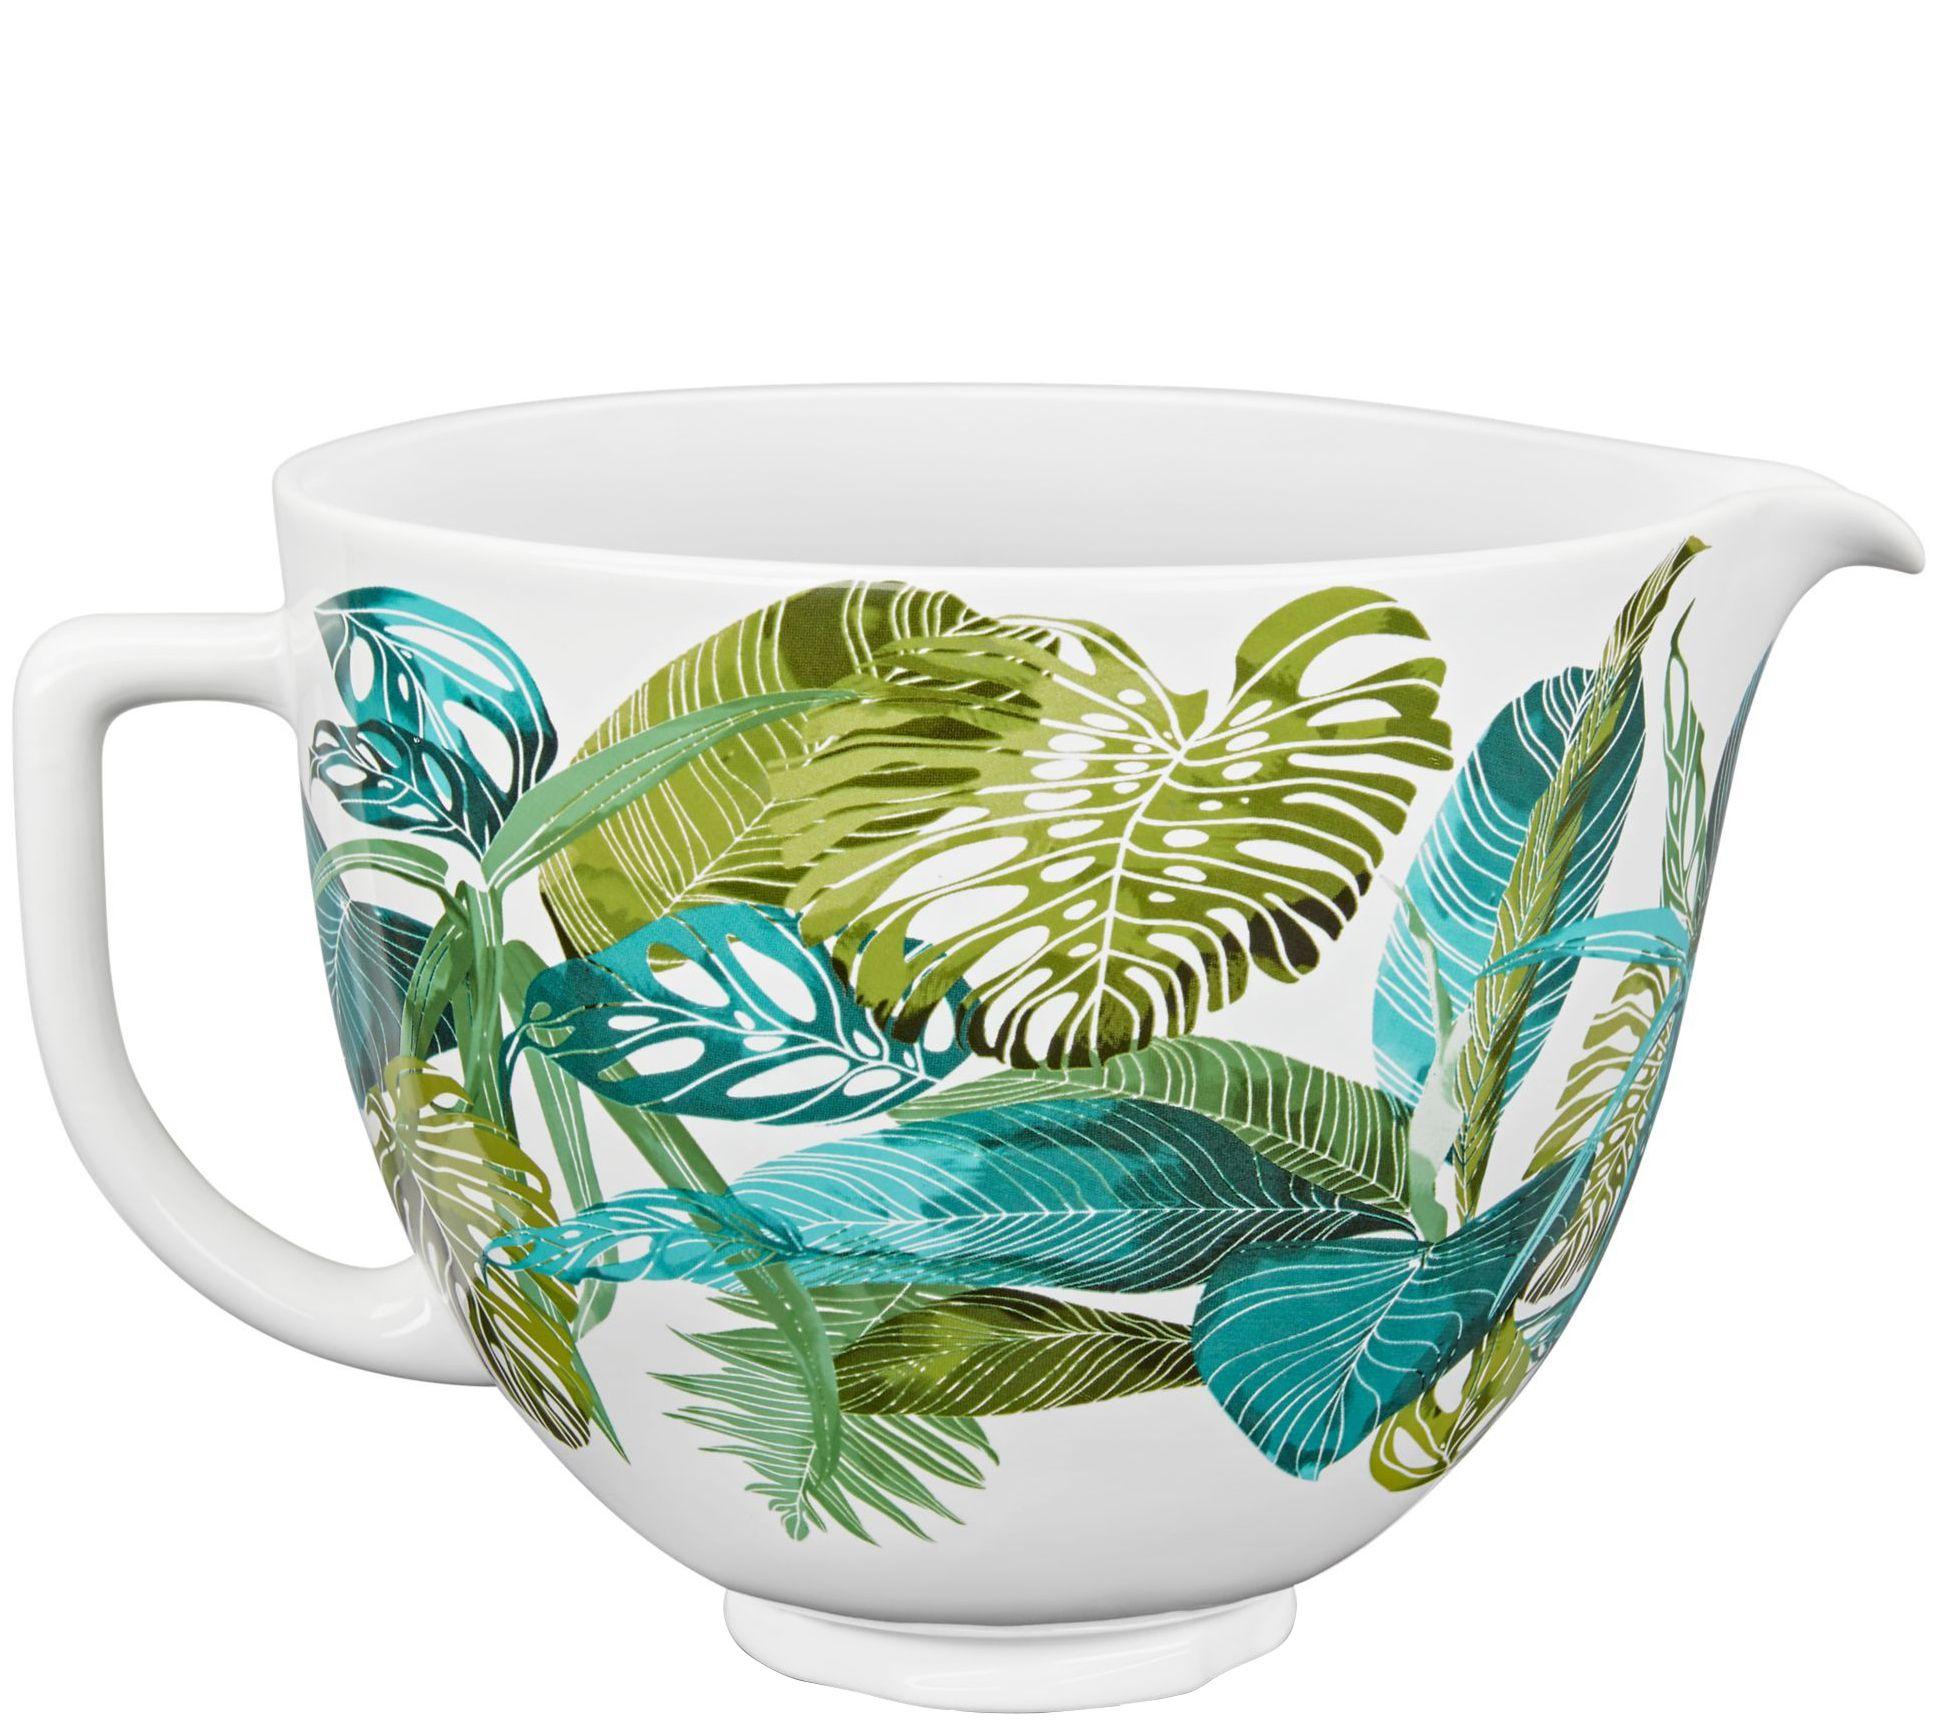 Kitchenaid 5 Quart Ceramic Patterned Bowl Tropical Floral